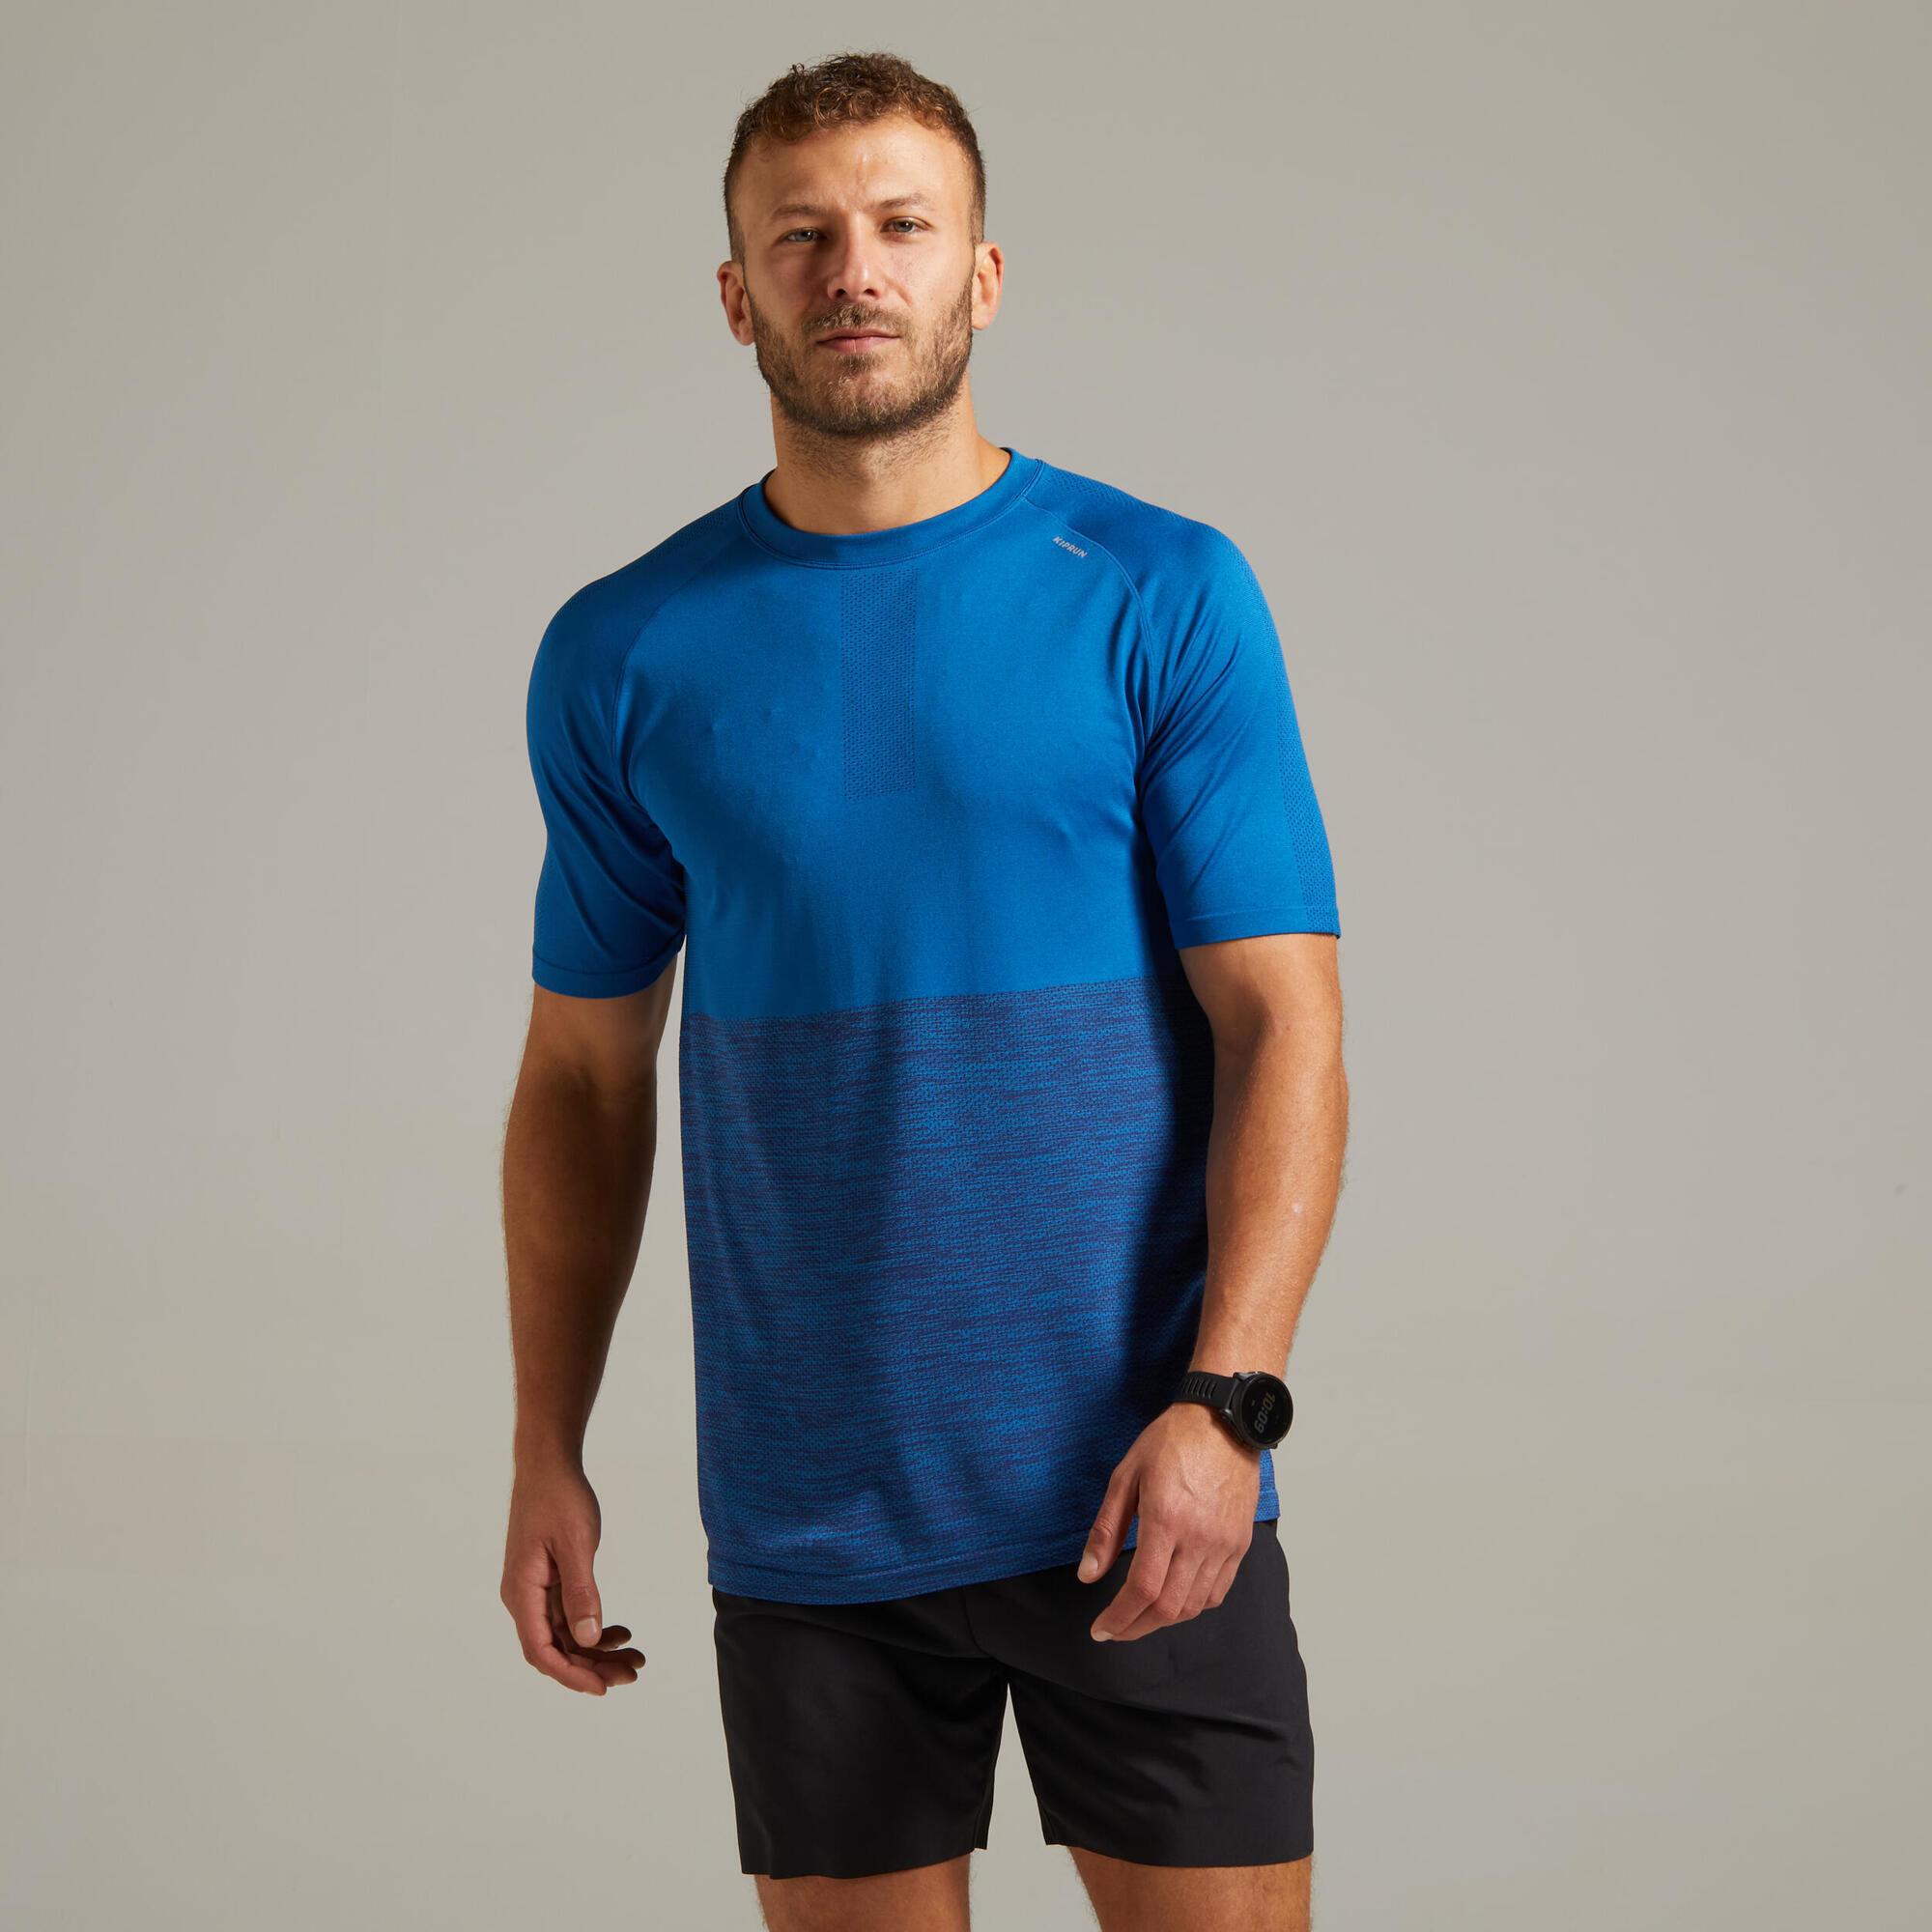 Koszulka do biegania męska Kiprun Care